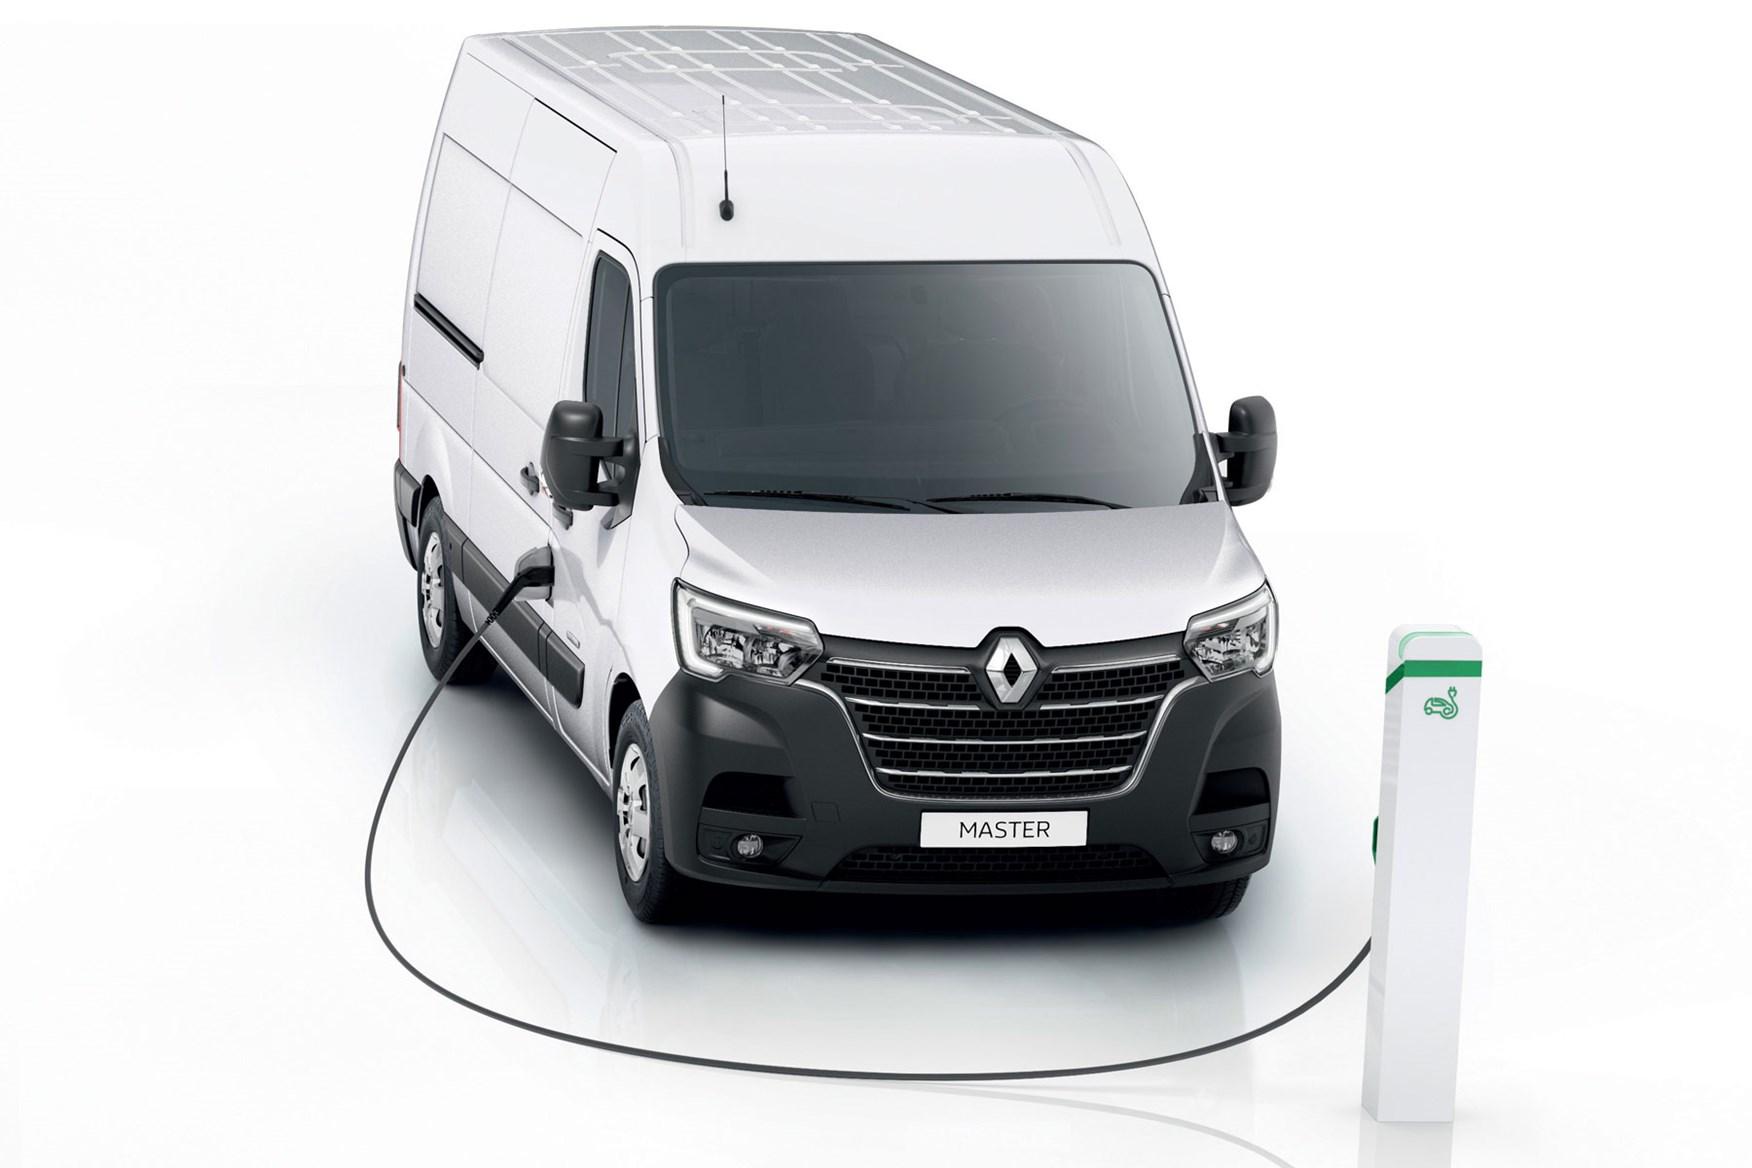 2019 Renault Master Facelift Full Details Of New Look